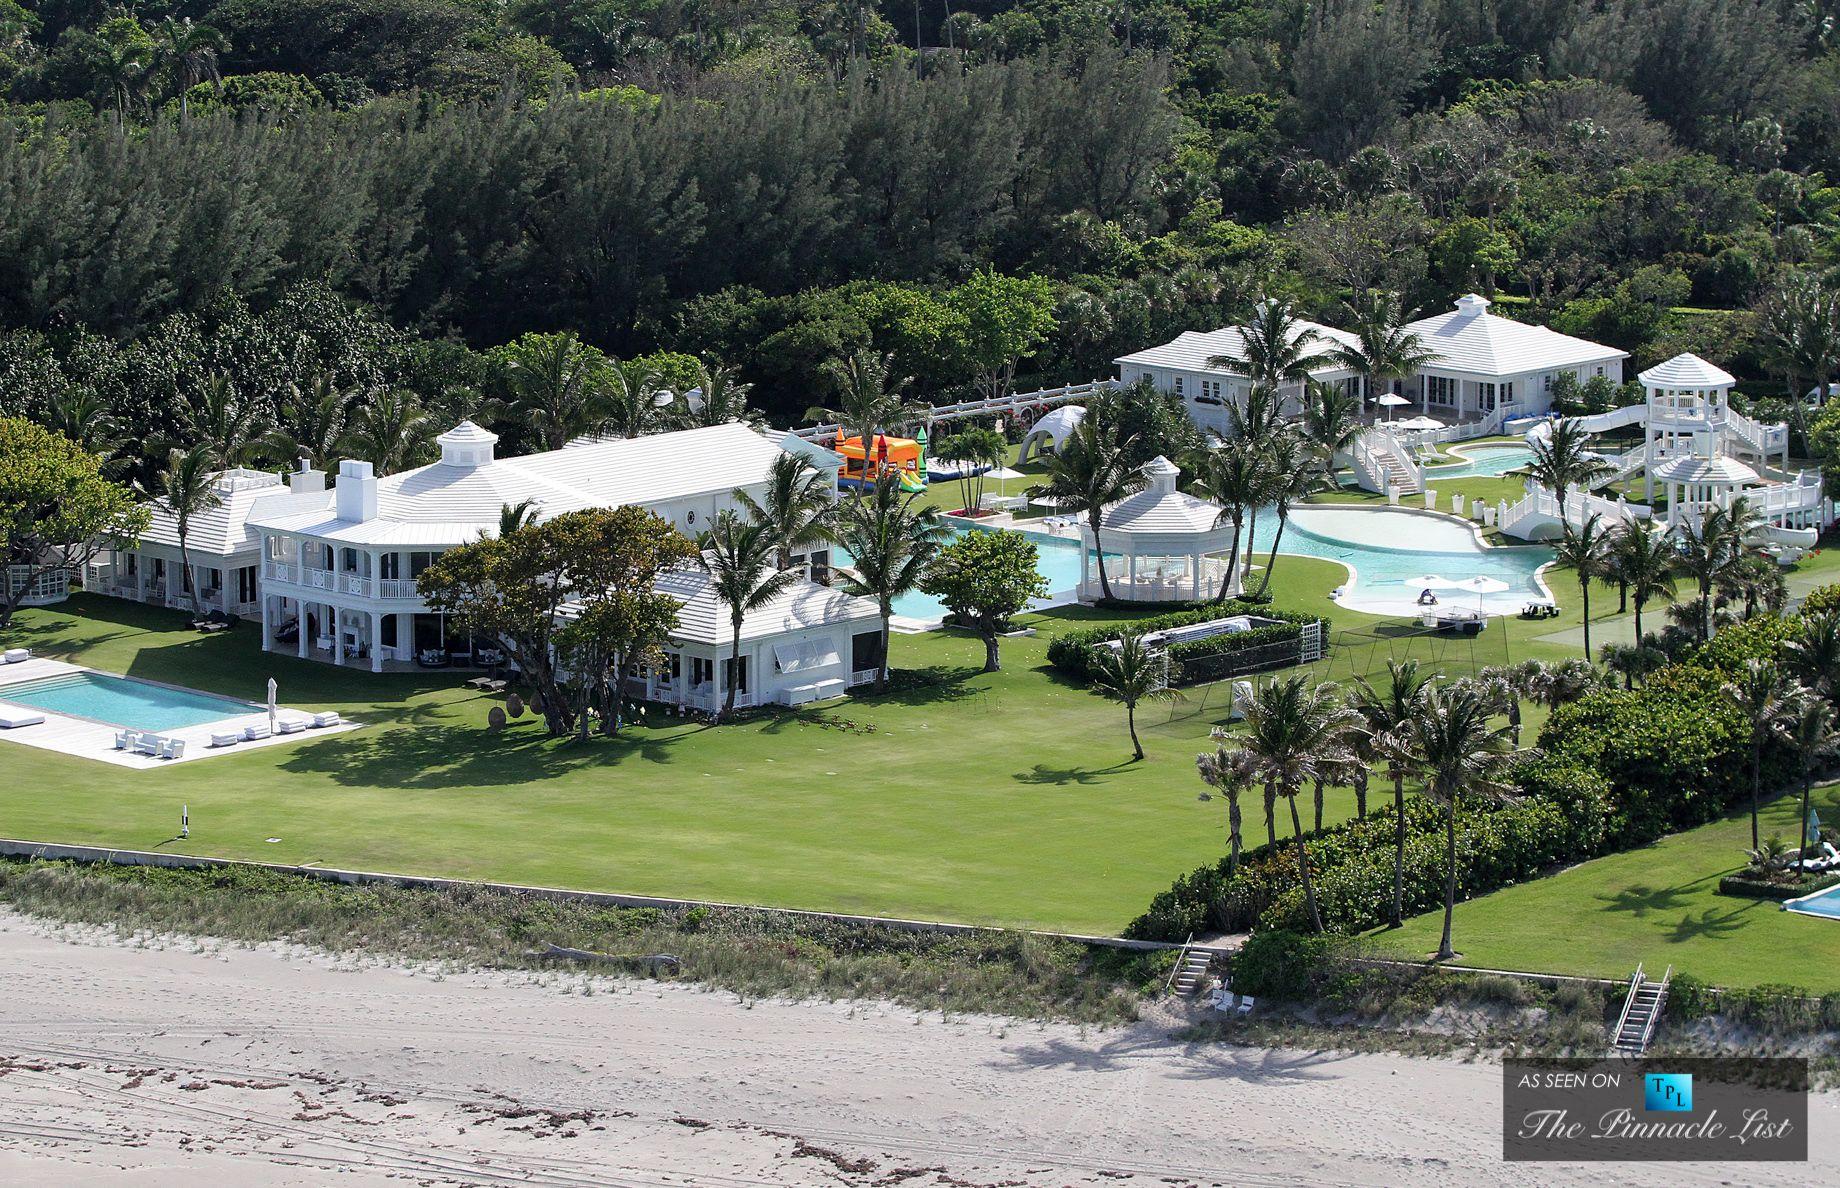 Dions Home Office. Dions Home Office. Celine Dion Residence   215 S Beach Rd